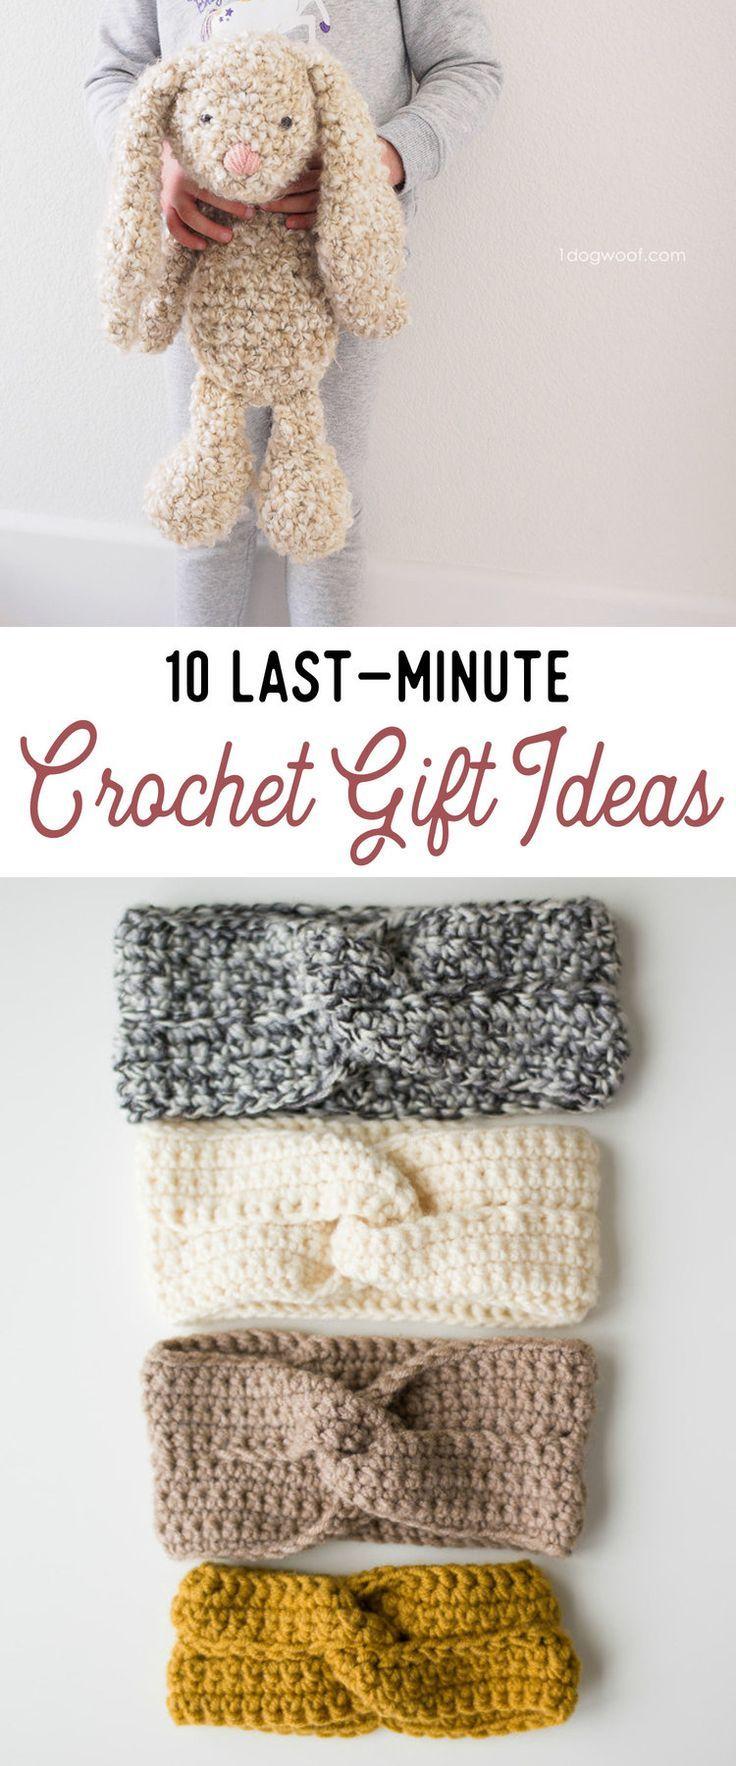 Ten Last Minute Crochet Gift Ideas - Free Crochet Patterns - Megmade ...